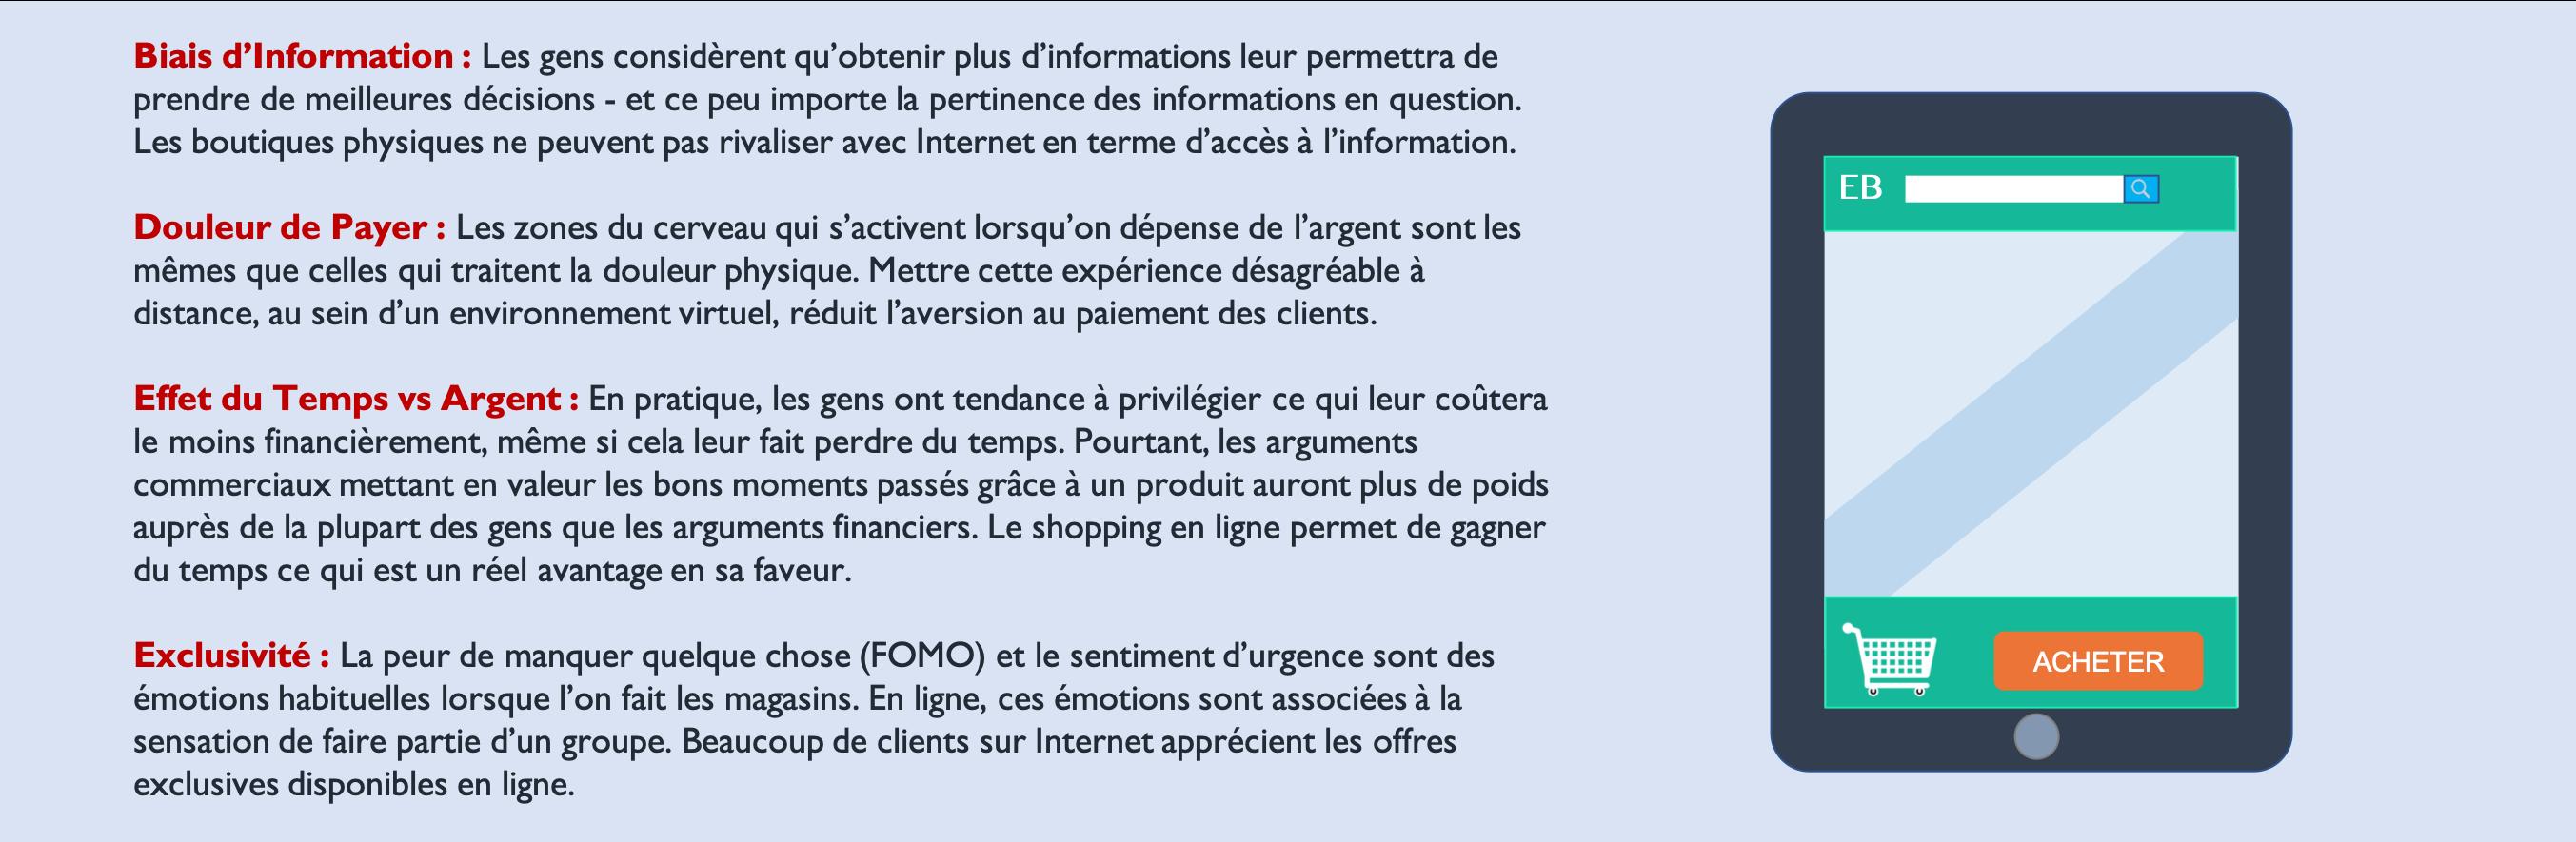 avantage du e-commerce